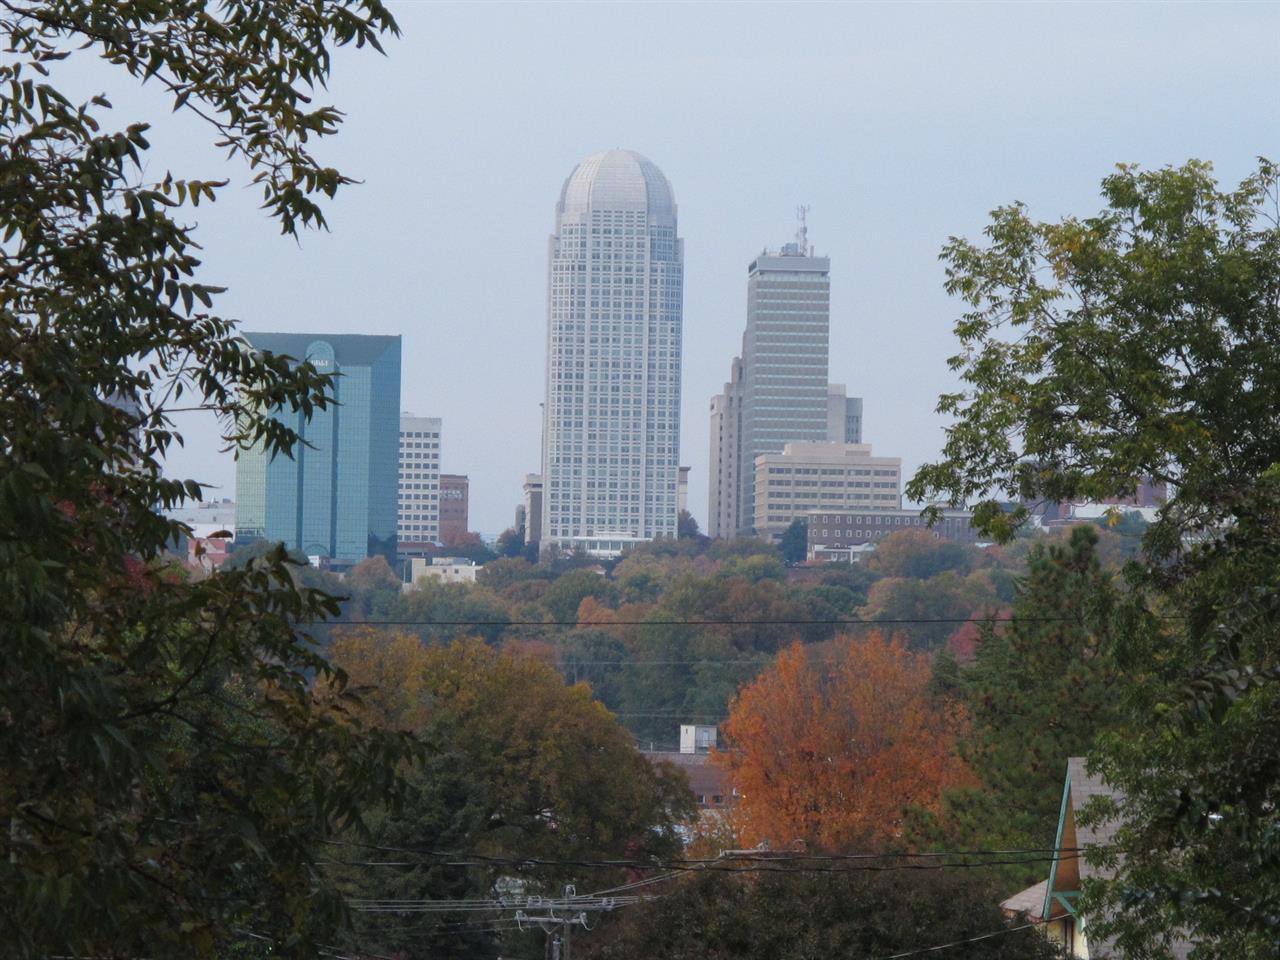 Winston-Salem,NC Skyline view in fall